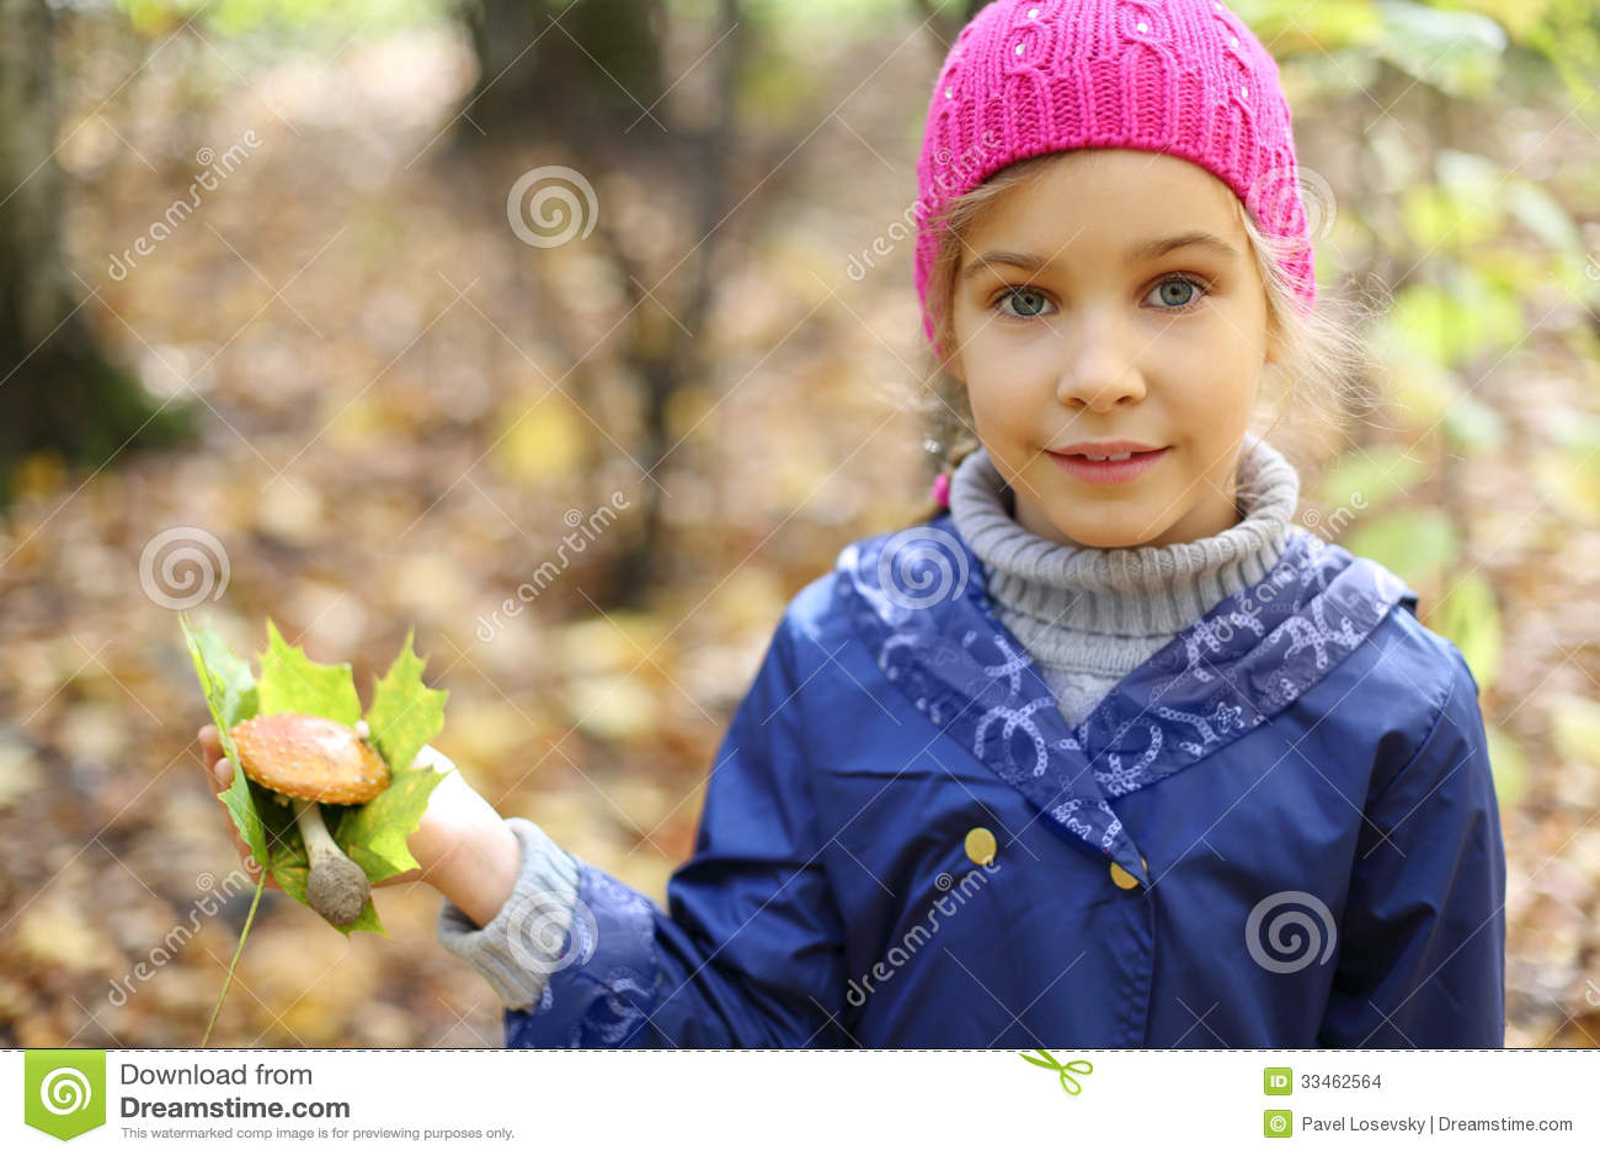 Smile little girl holds maple leaf